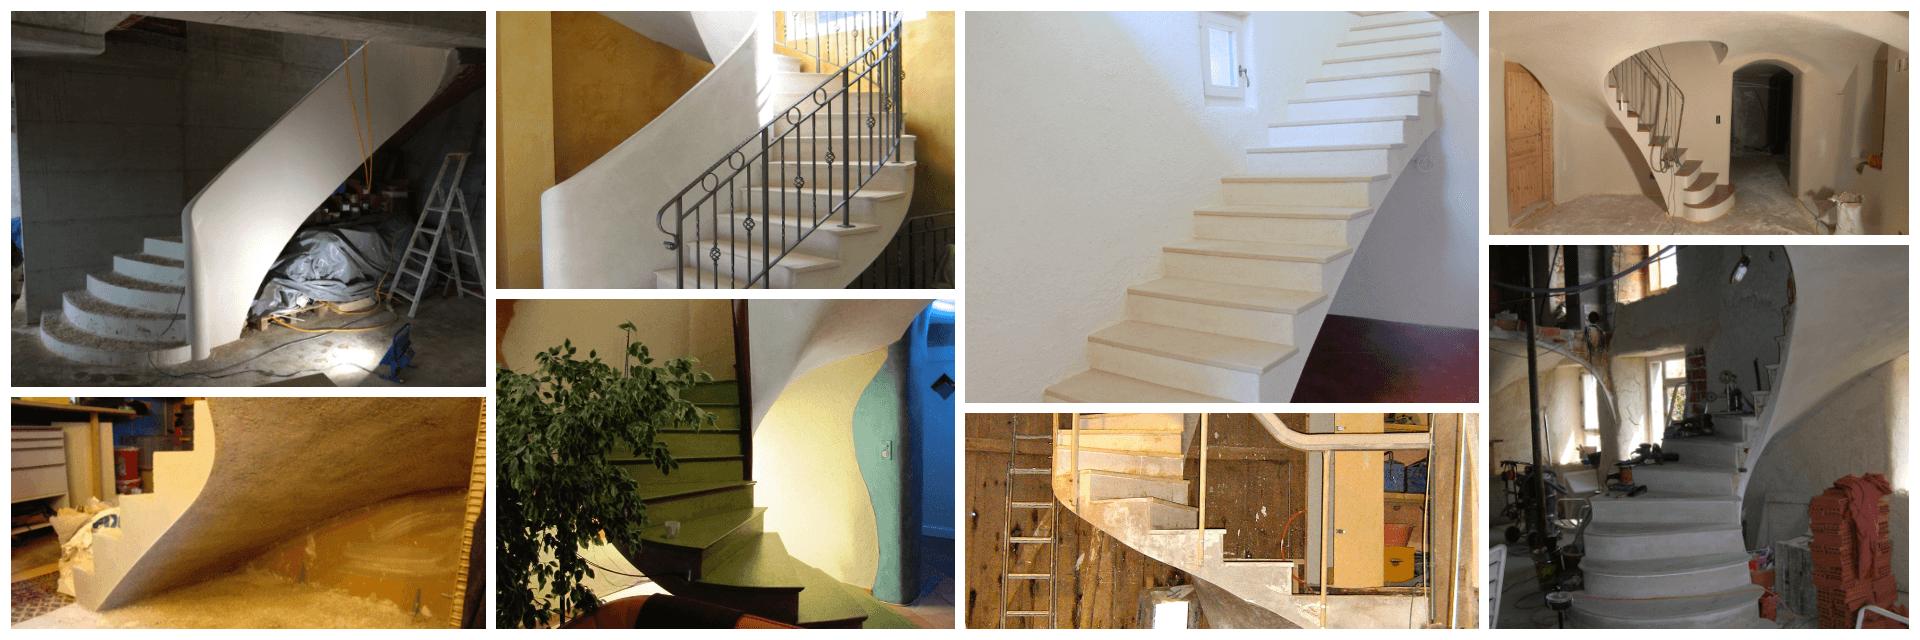 Album escaliers voute sarrasine